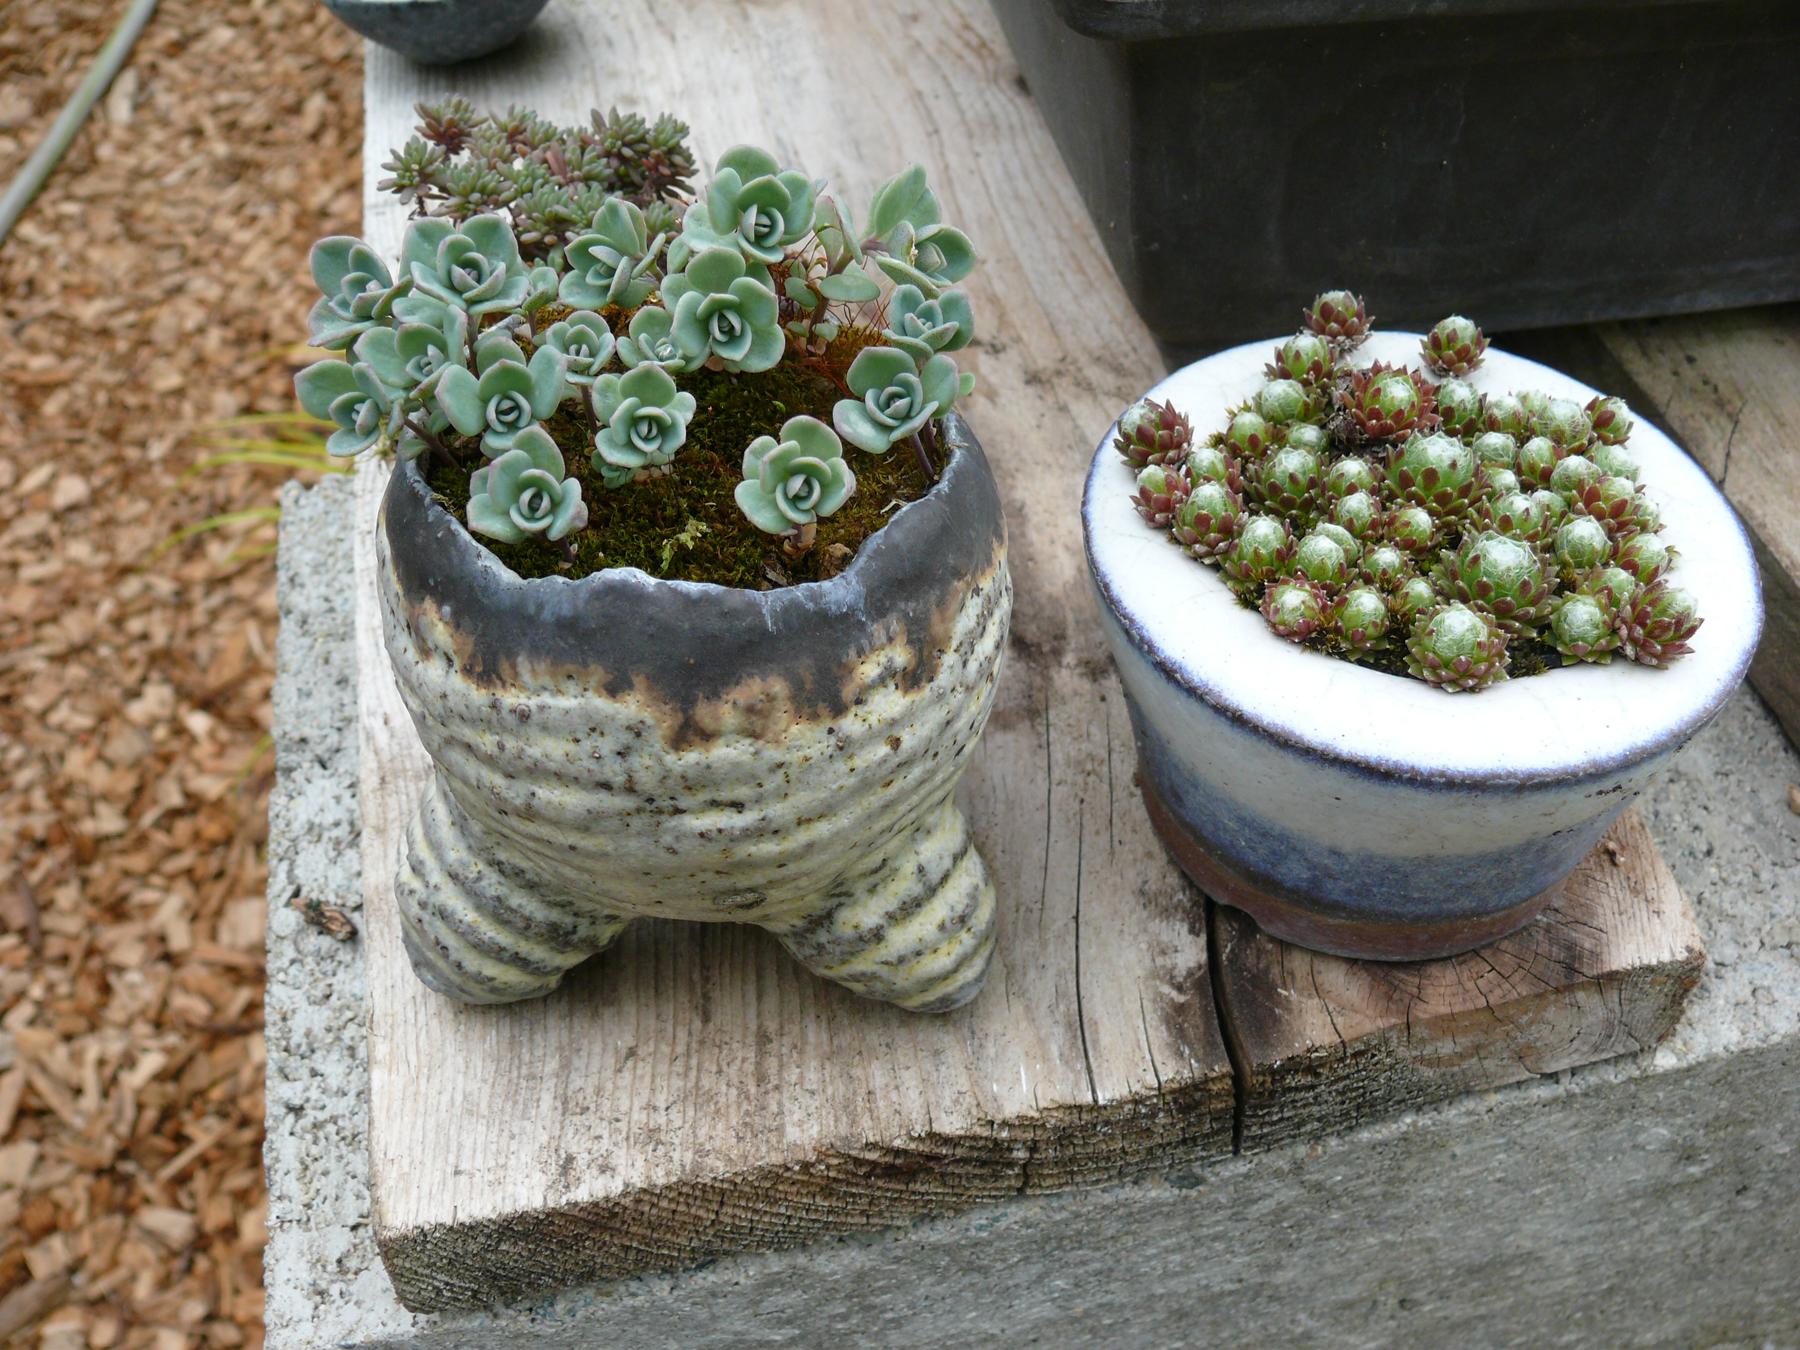 Sedum sieboldii dans un pot de Horst Heinzlreiter